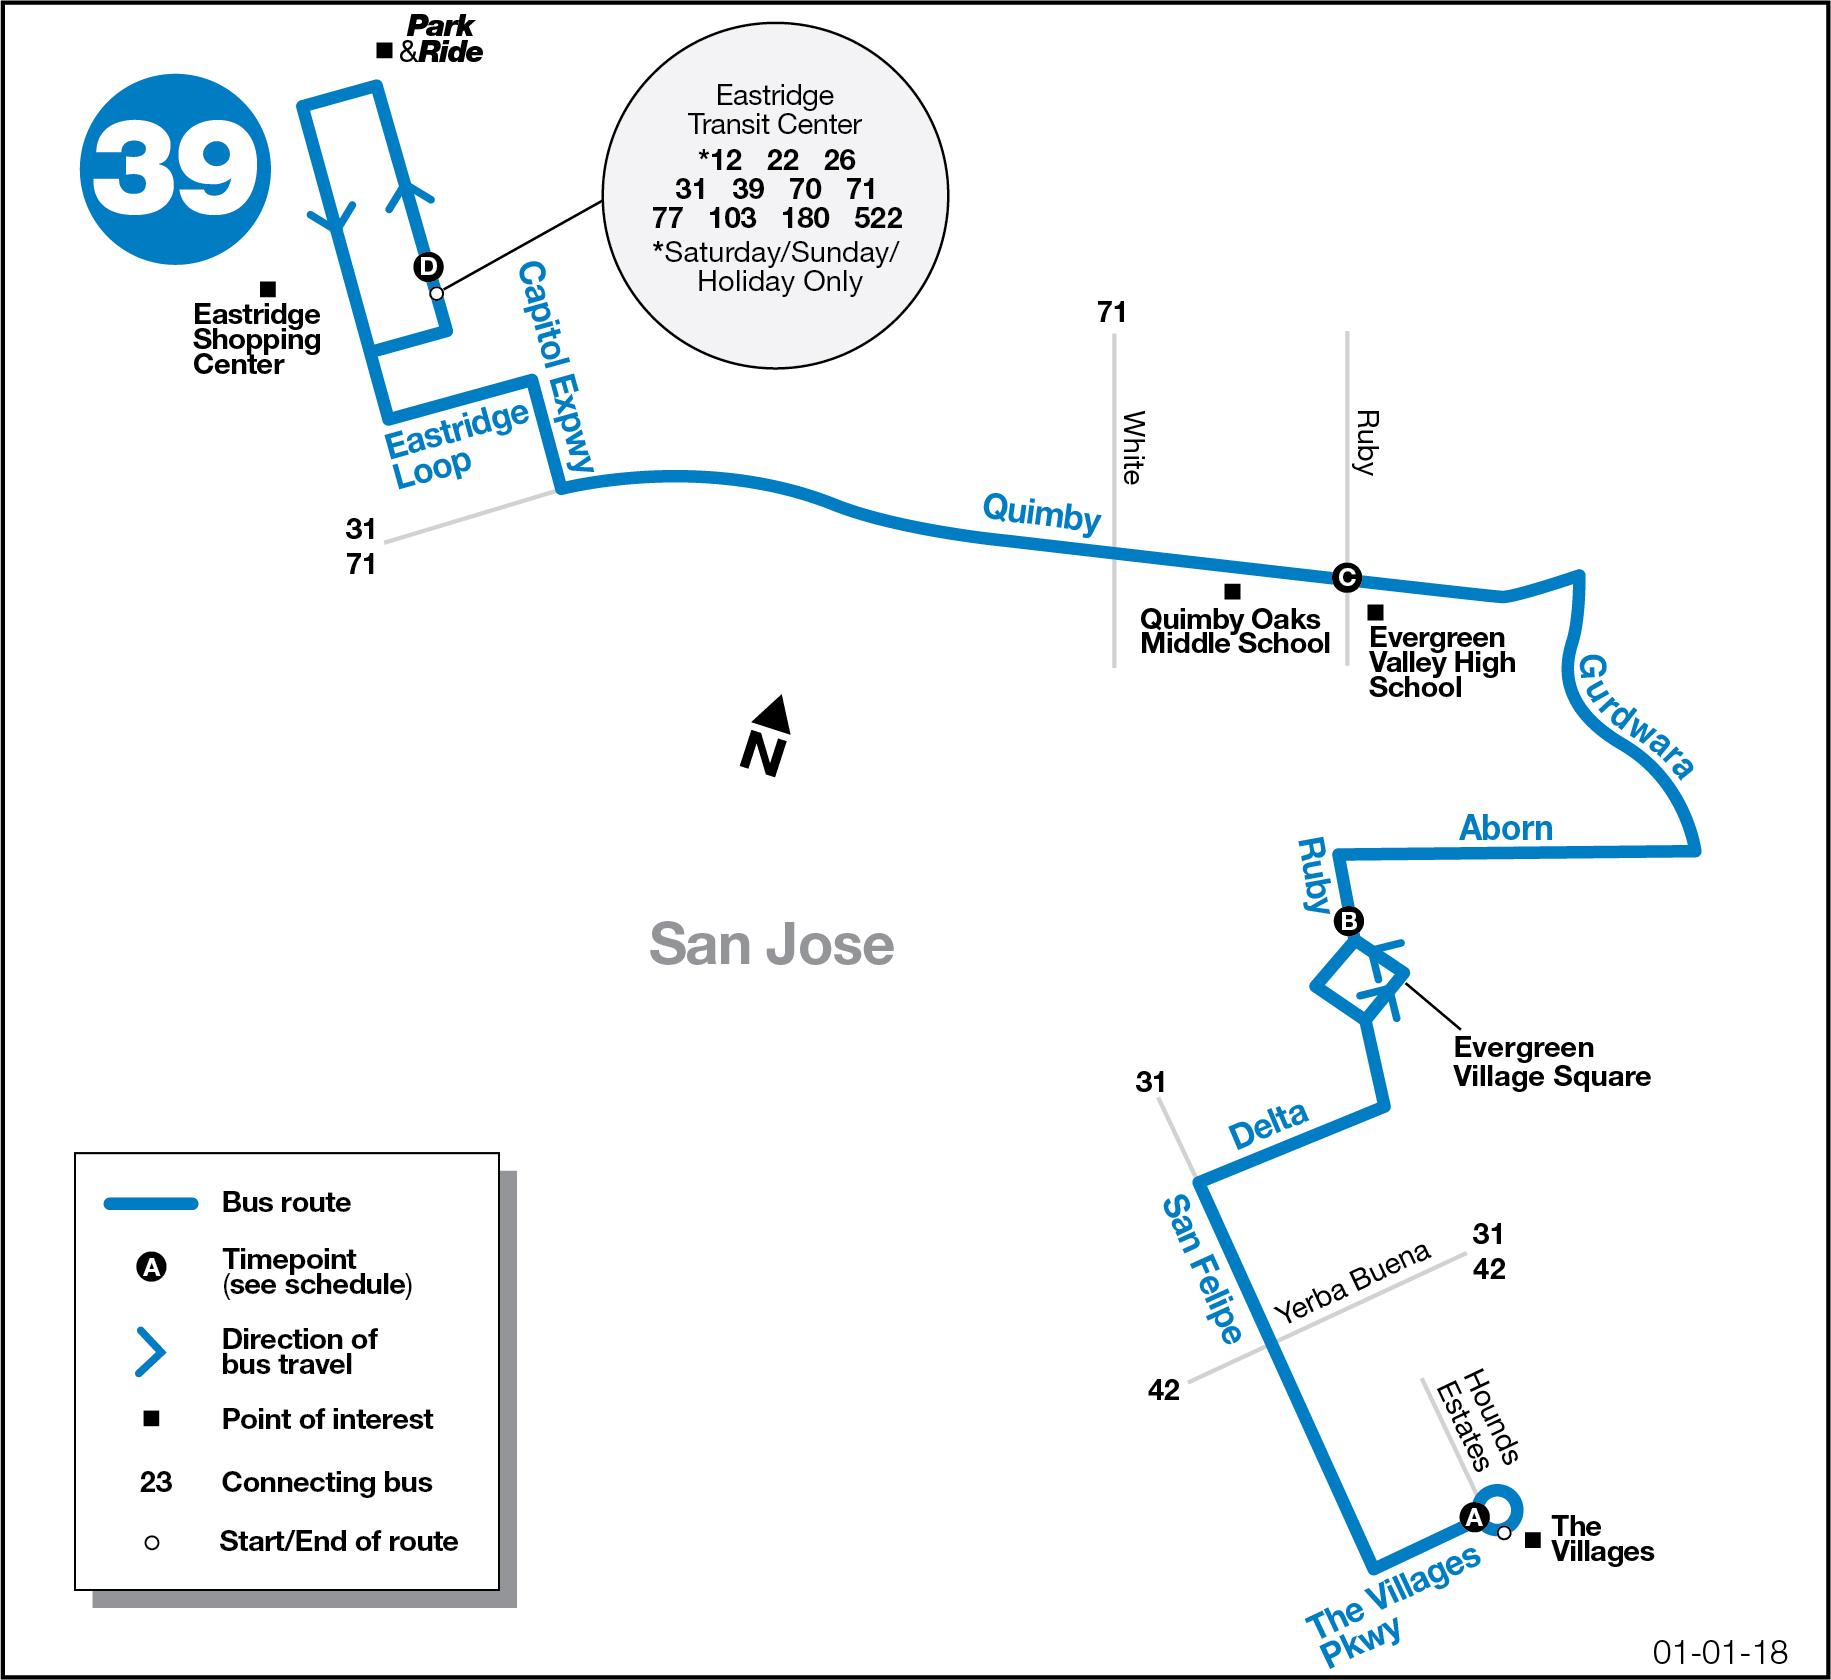 39 The Villages to Eastridge Transit Center